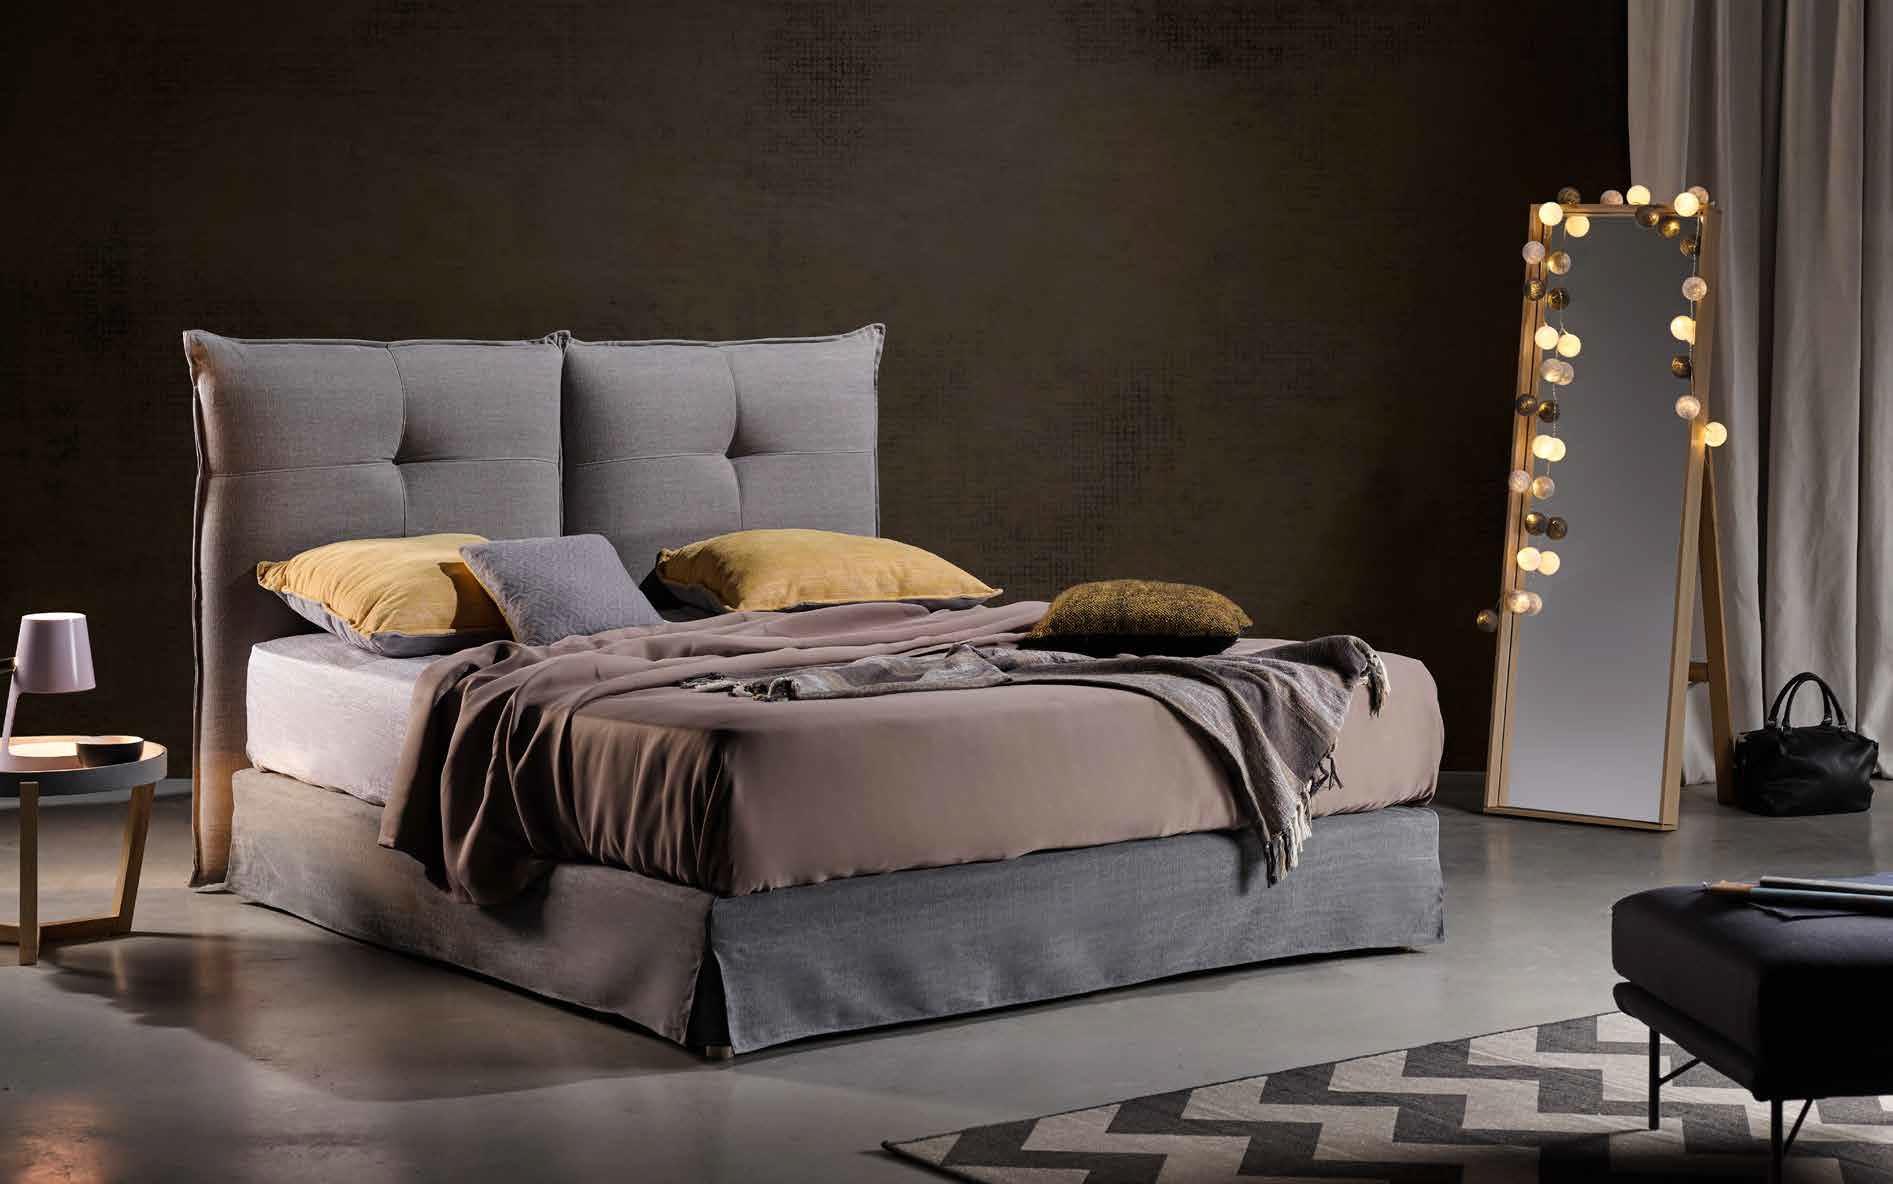 cabeceros-tapizados-general-muebles-paco-caballero-1837-5cae27cea4b53